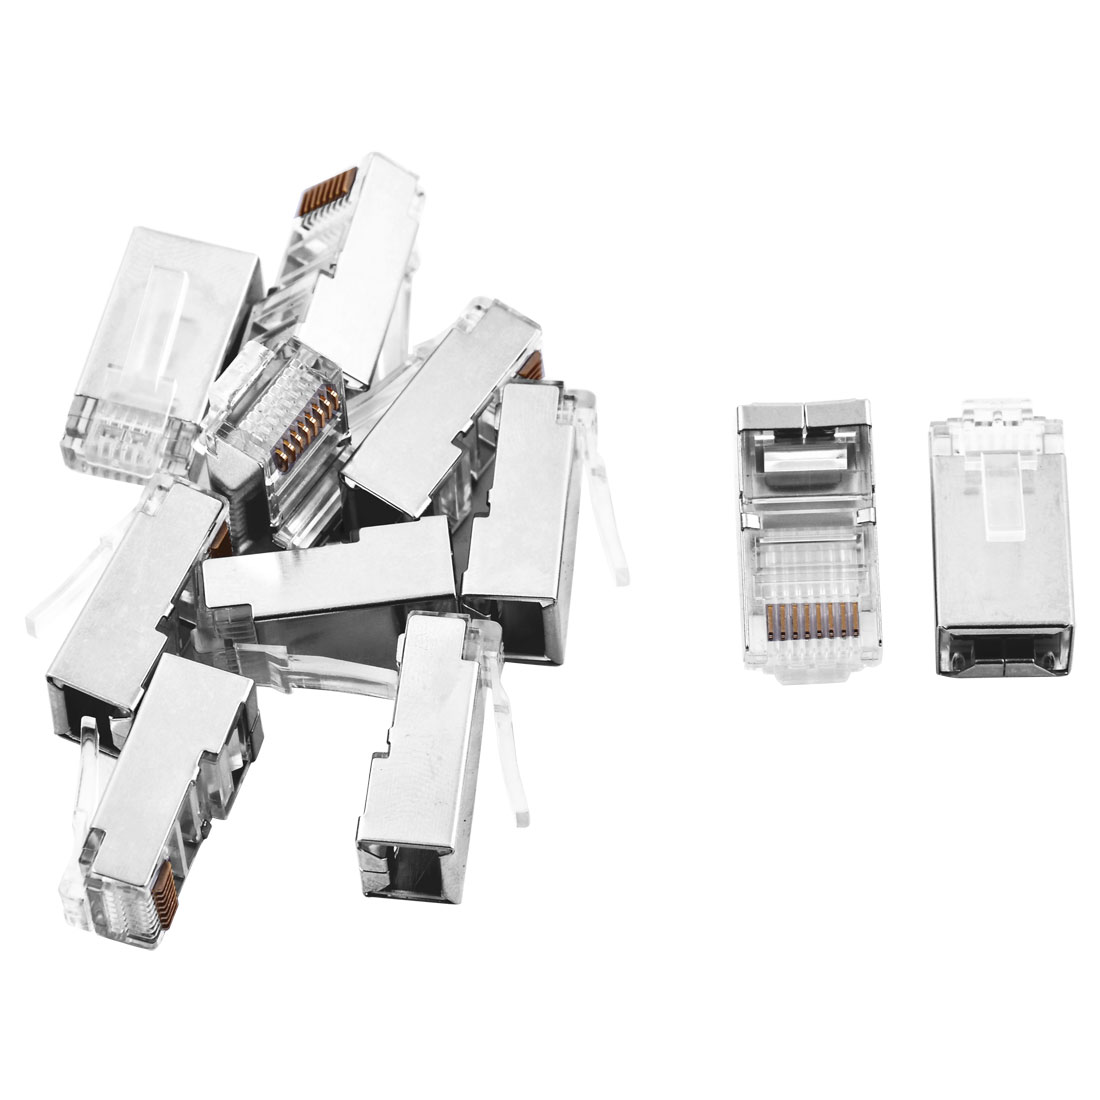 11pcs RJ45 8P8C CAT5 Modular Adapter Ethernet Network Shielded Crimp Connector